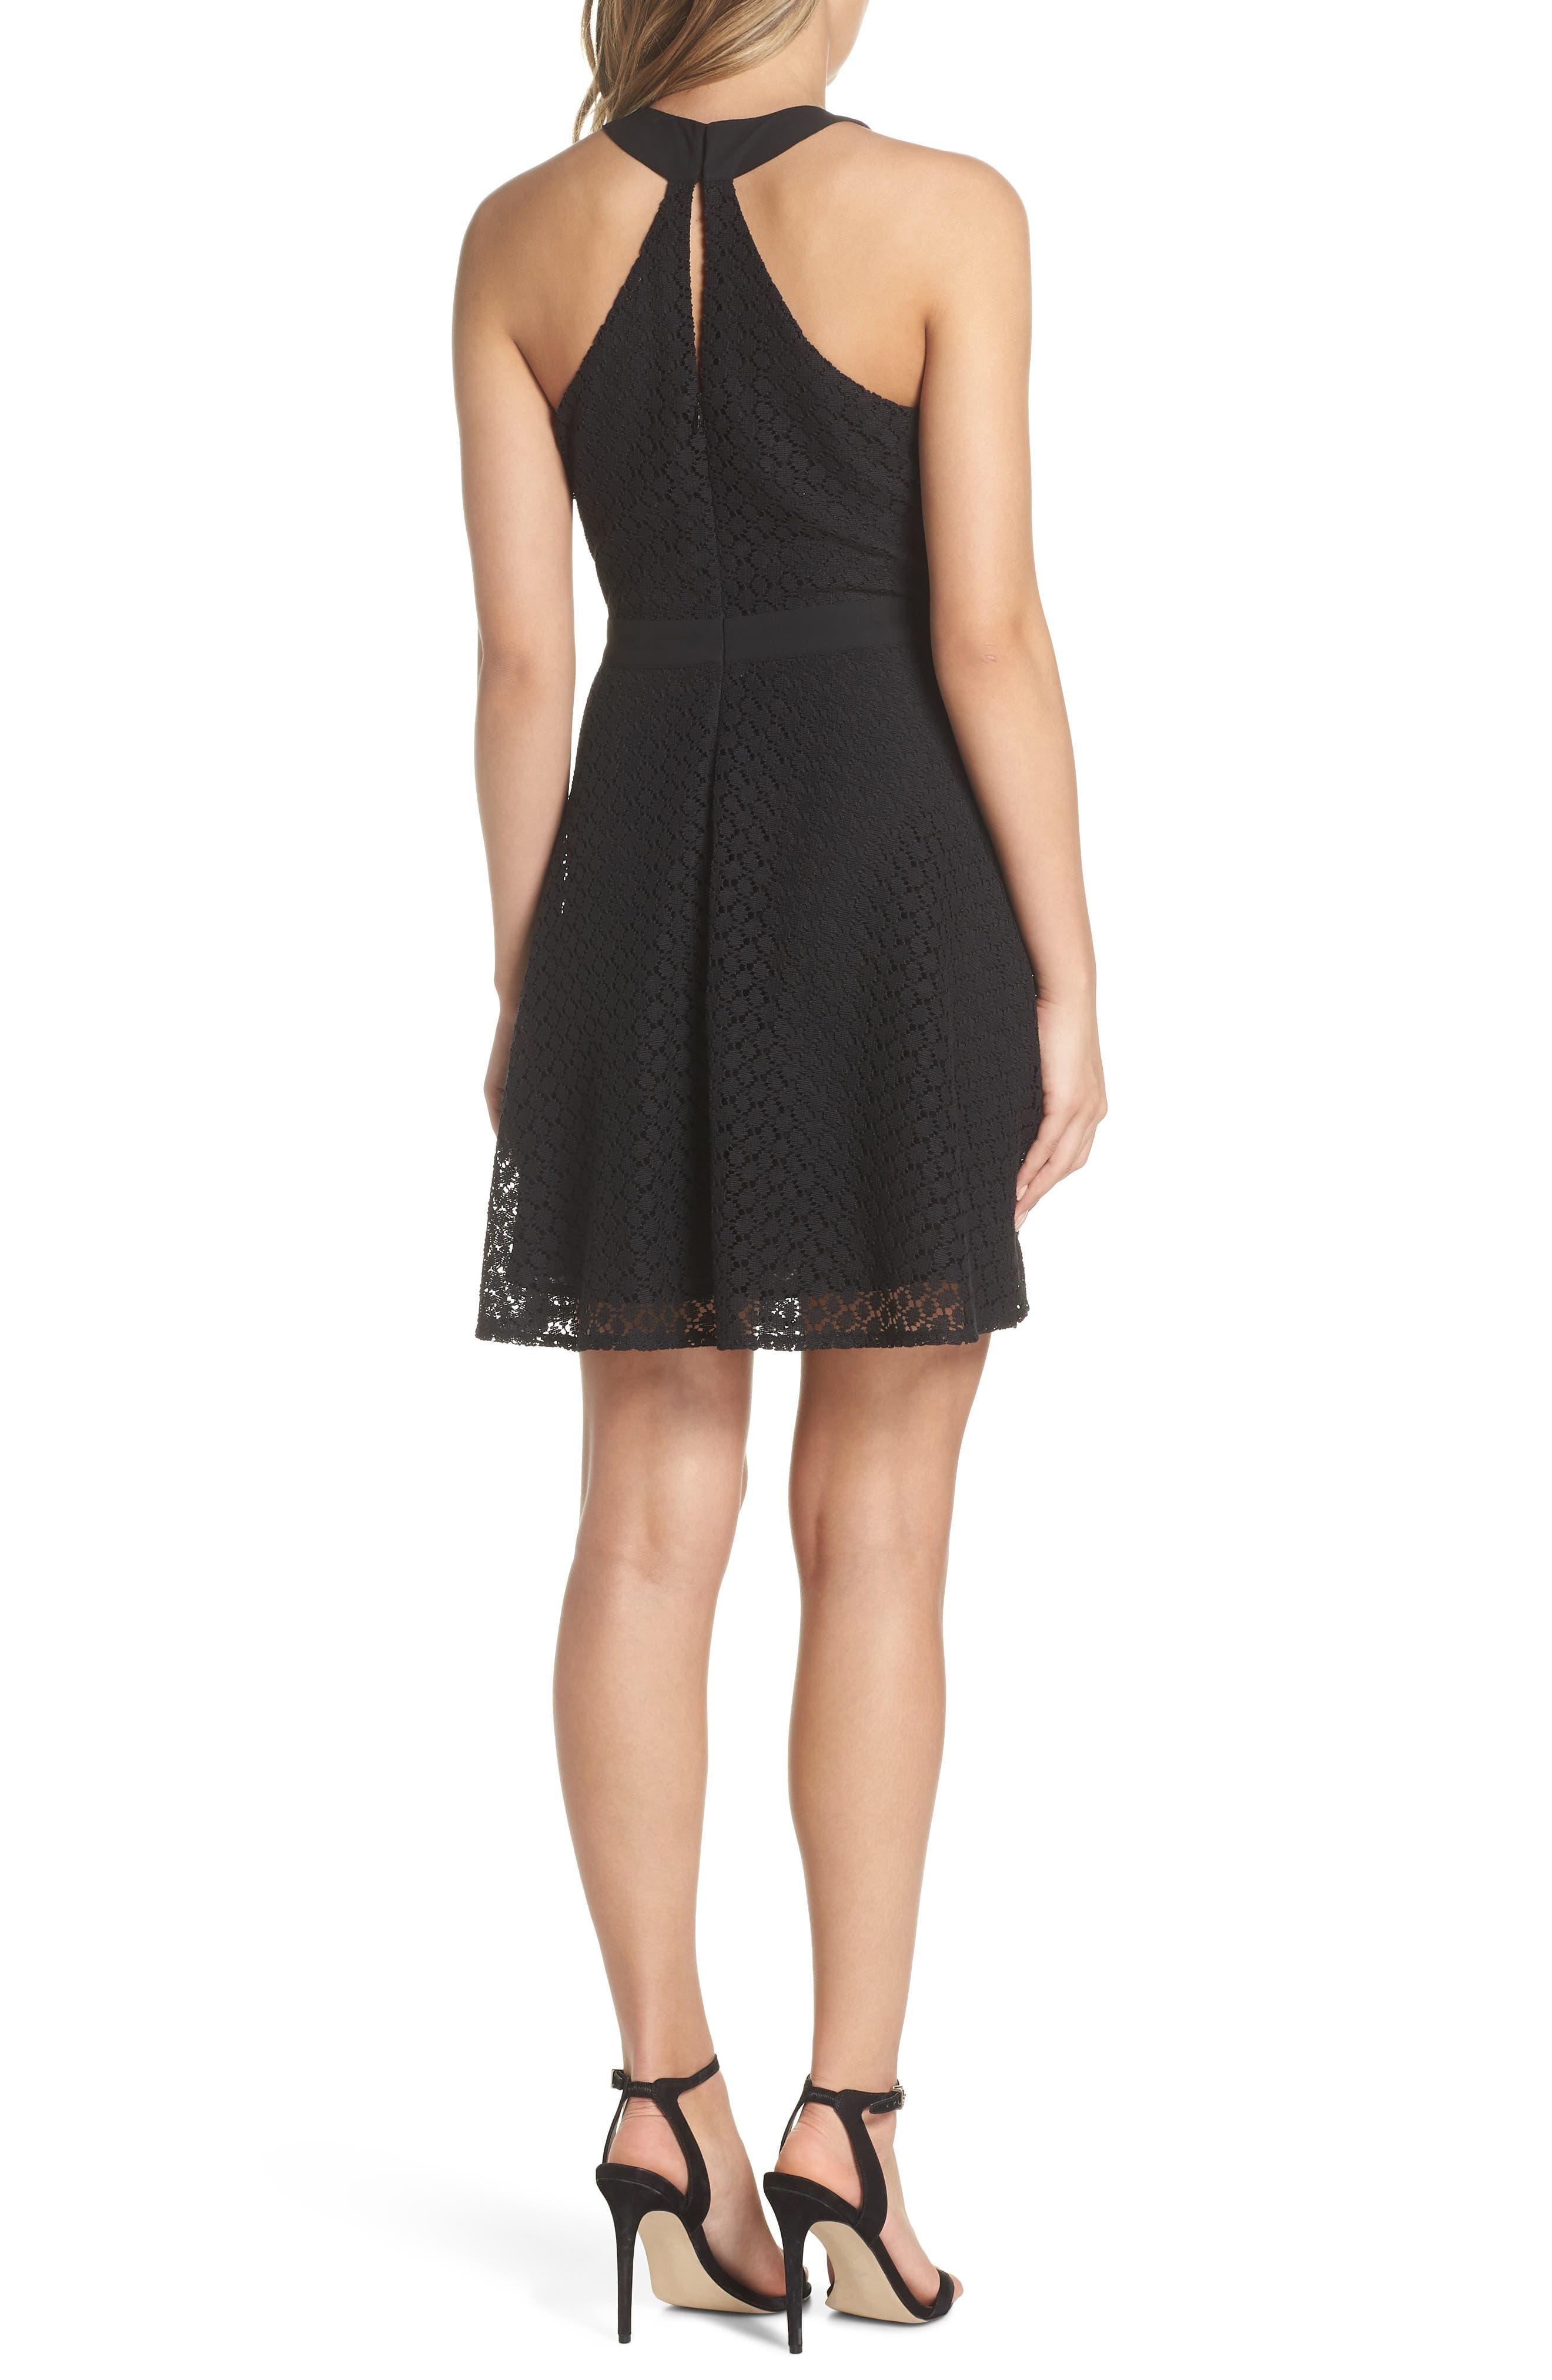 19 COOPER,                             Lace Halter Dress,                             Alternate thumbnail 2, color,                             001